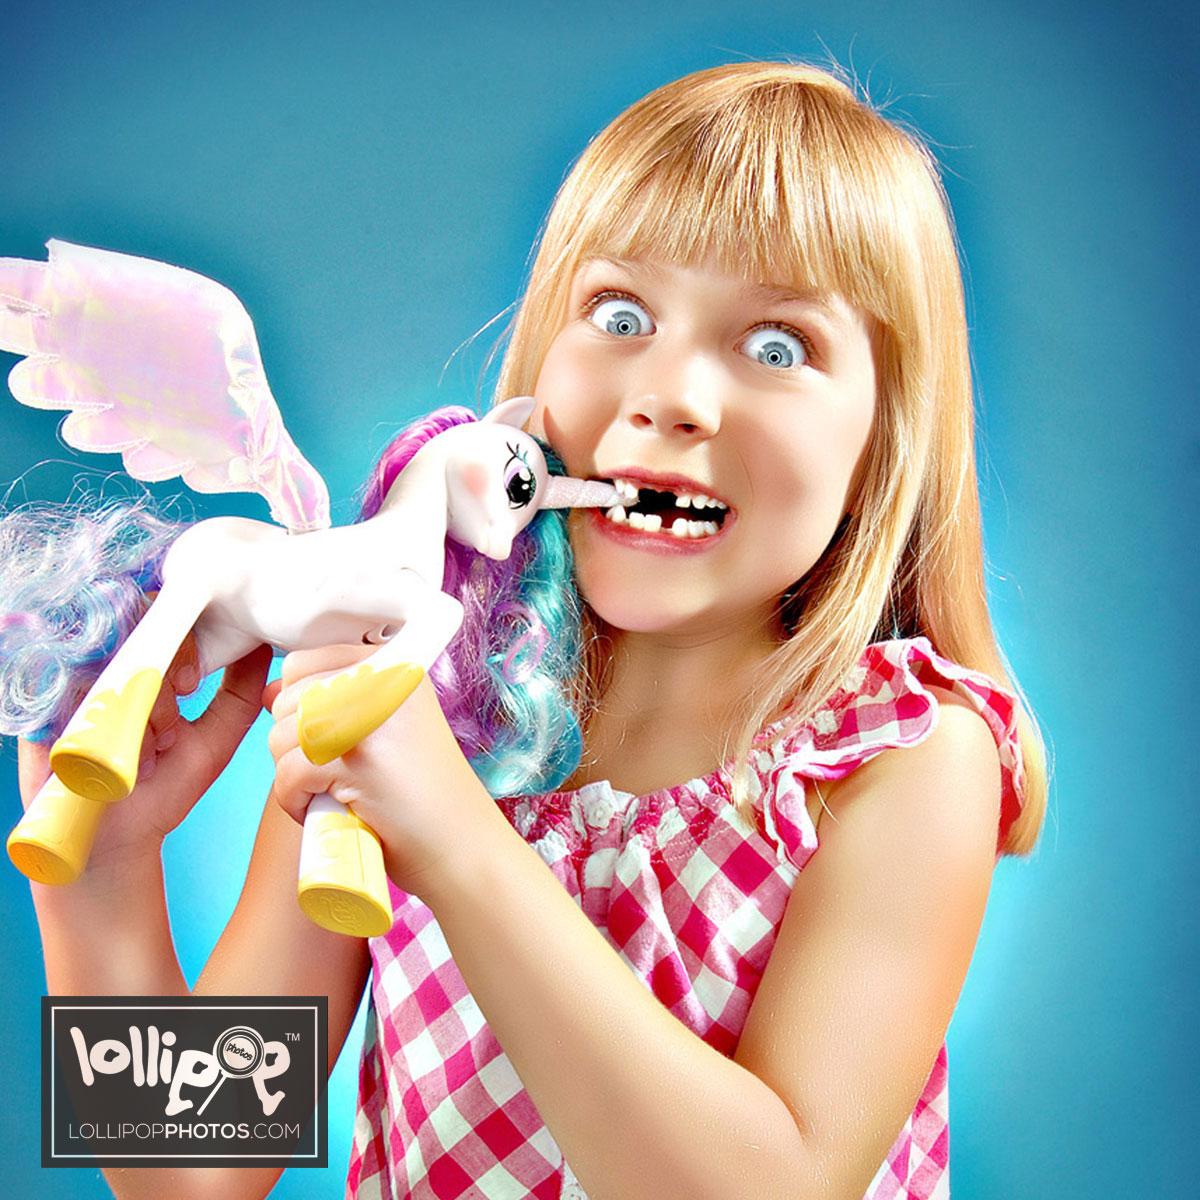 msdig-nora-canfield-lollipop-photos-323.jpg